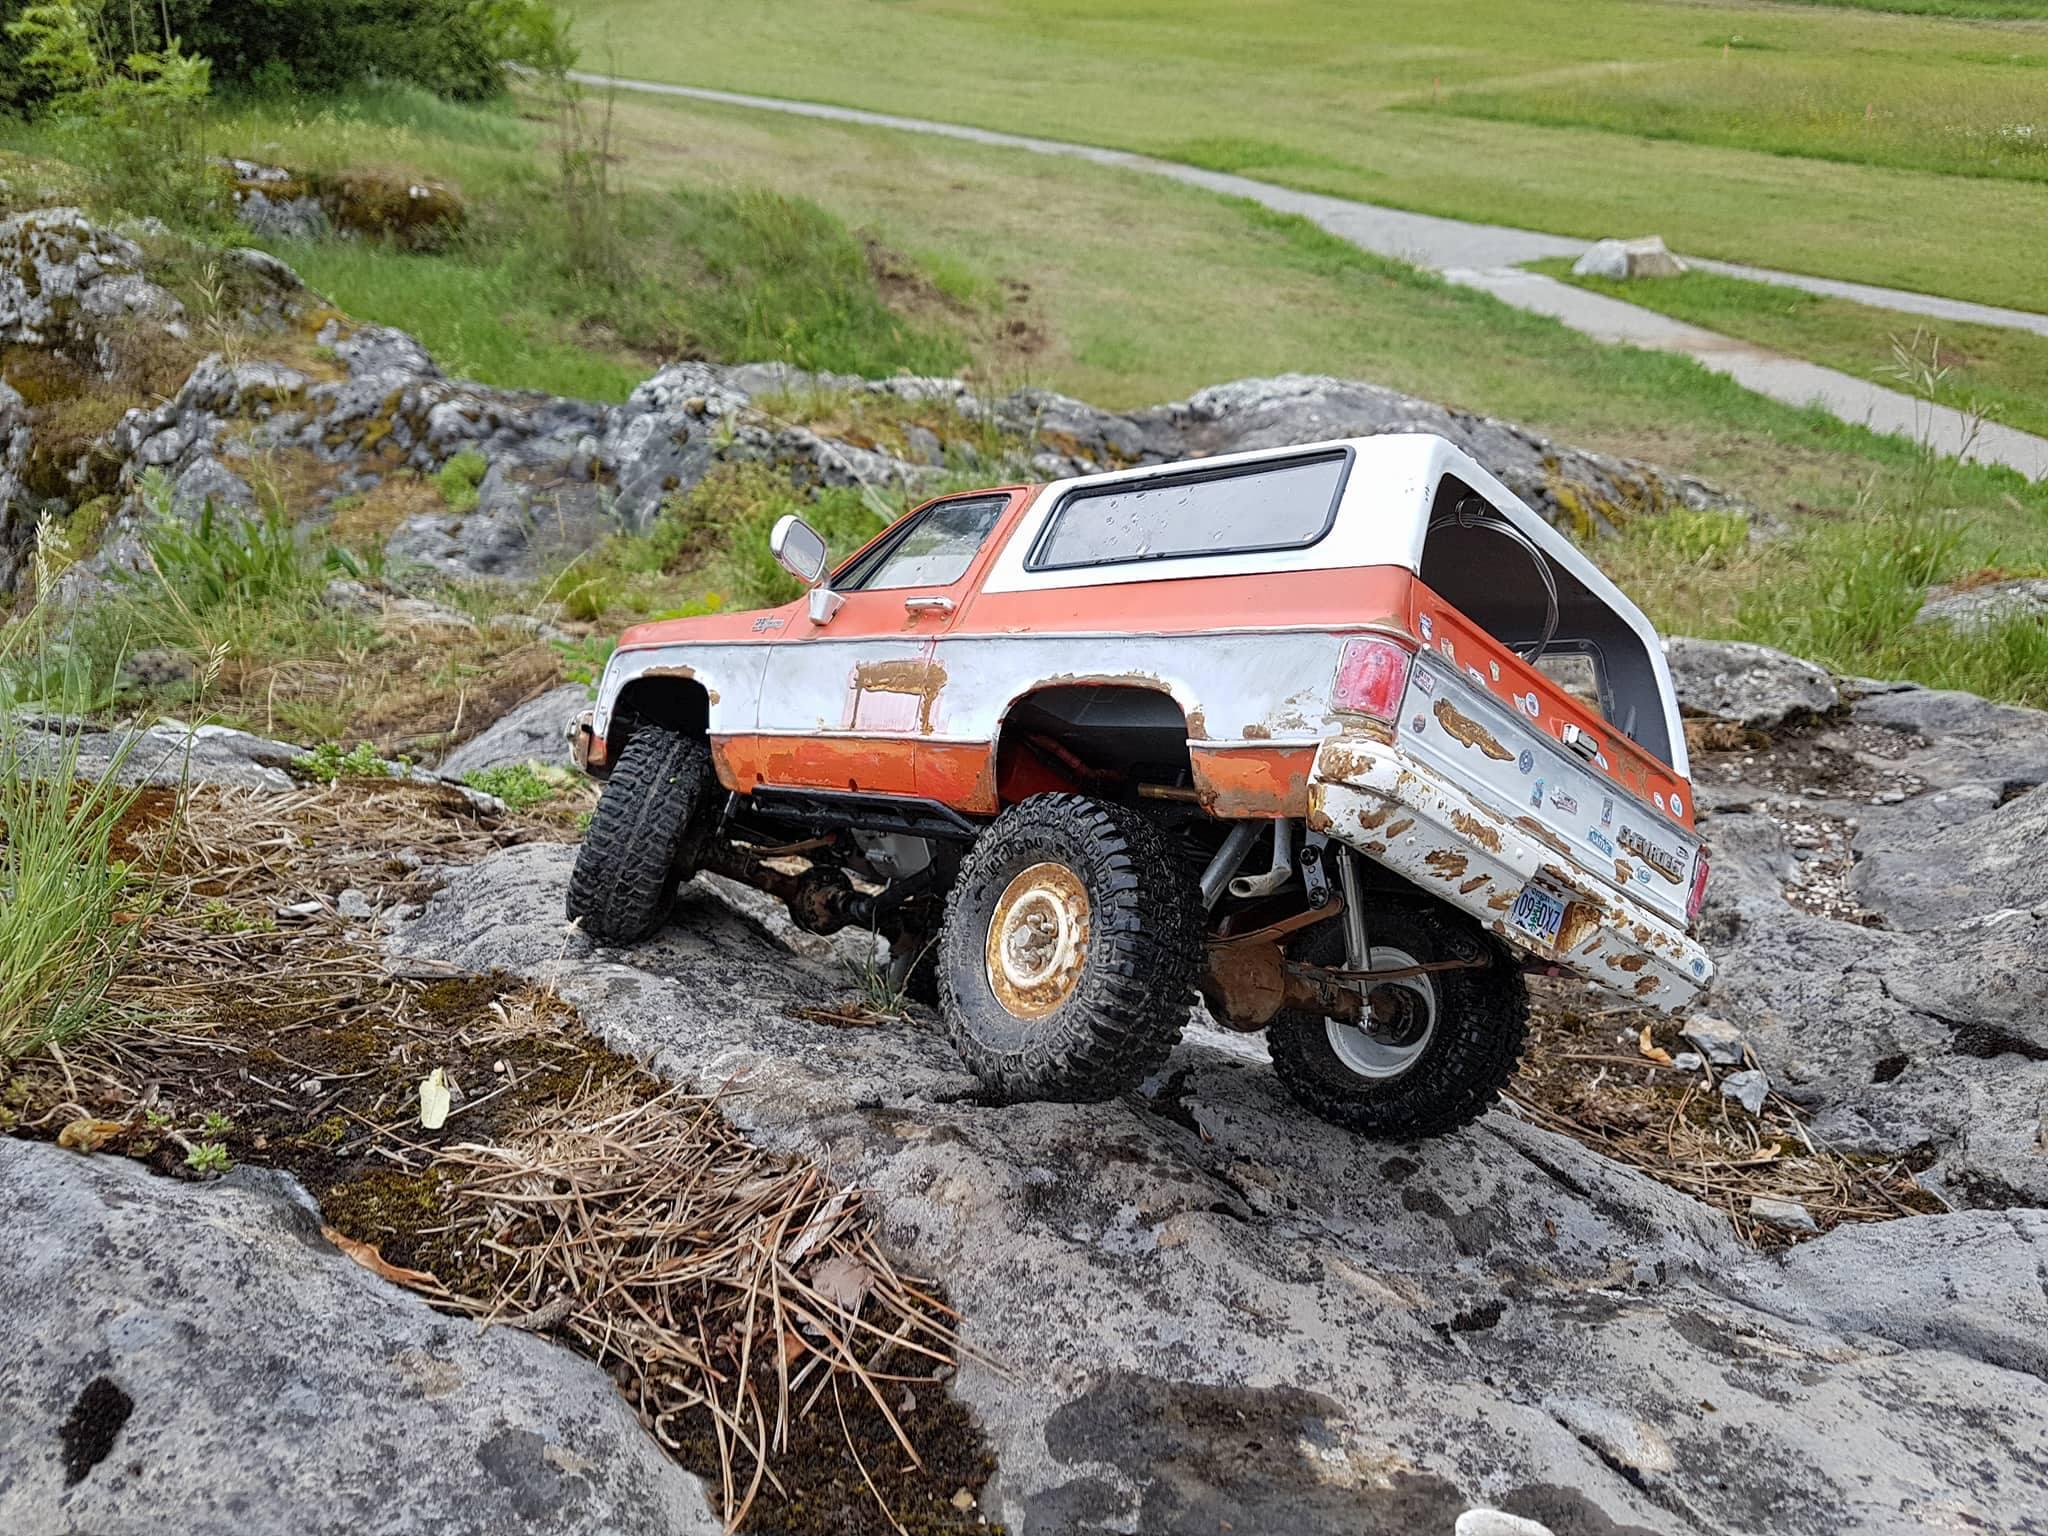 Farm Truck Chevrolet Blazer K5 sur TF2, Road Trip ! - Page 2 849414189271391288510534600820285039015o